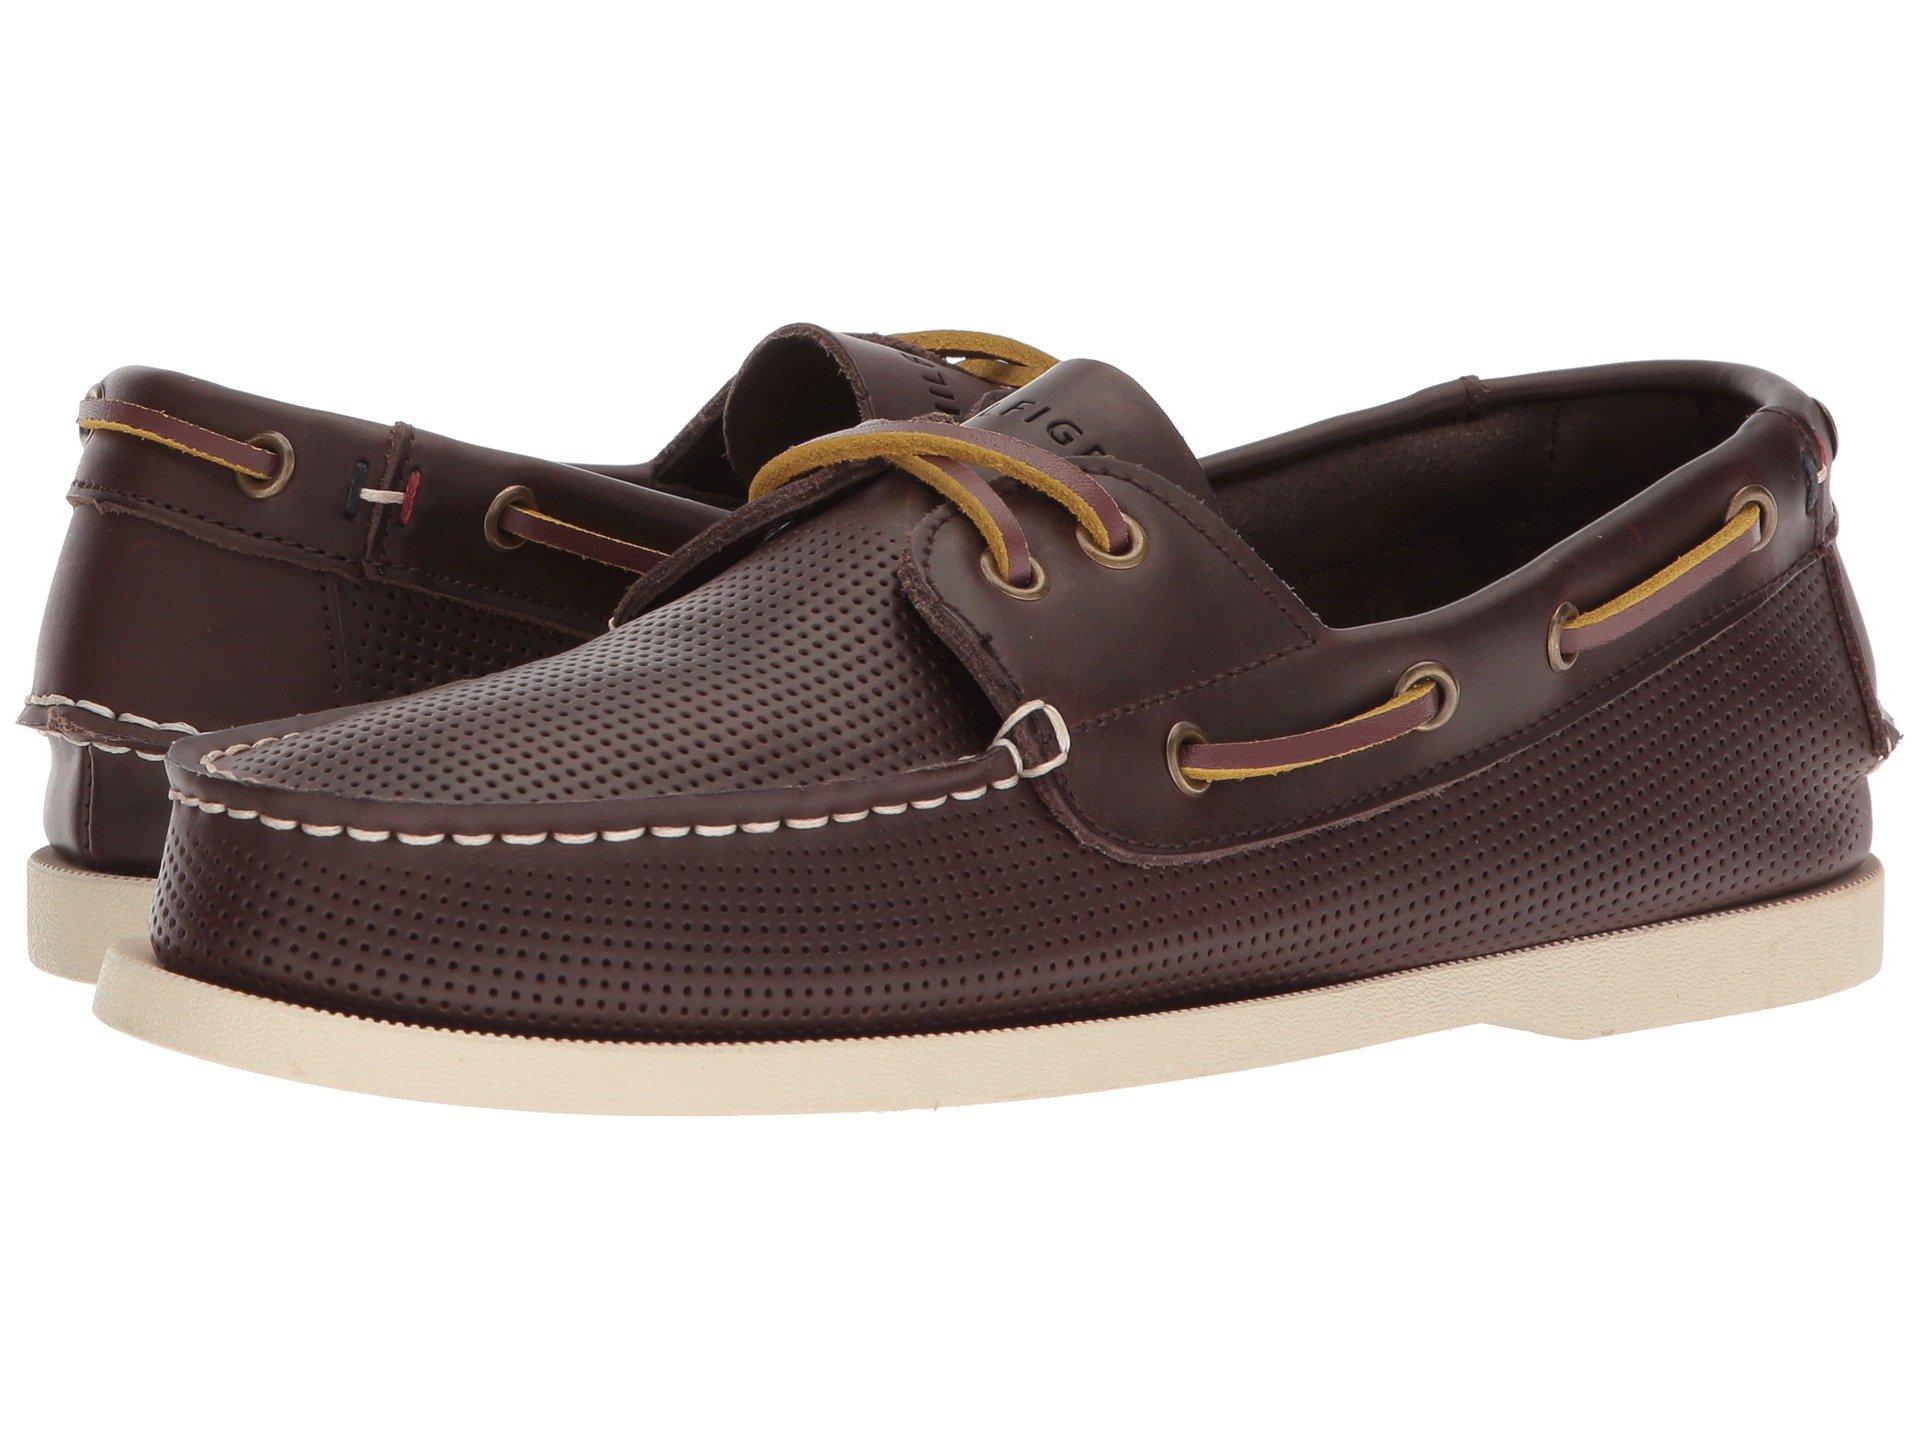 Calzado Tipo Boat Shoe para Hombre Tommy Hilfiger Bowman 8  + Tommy Hilfiger en VeoyCompro.net